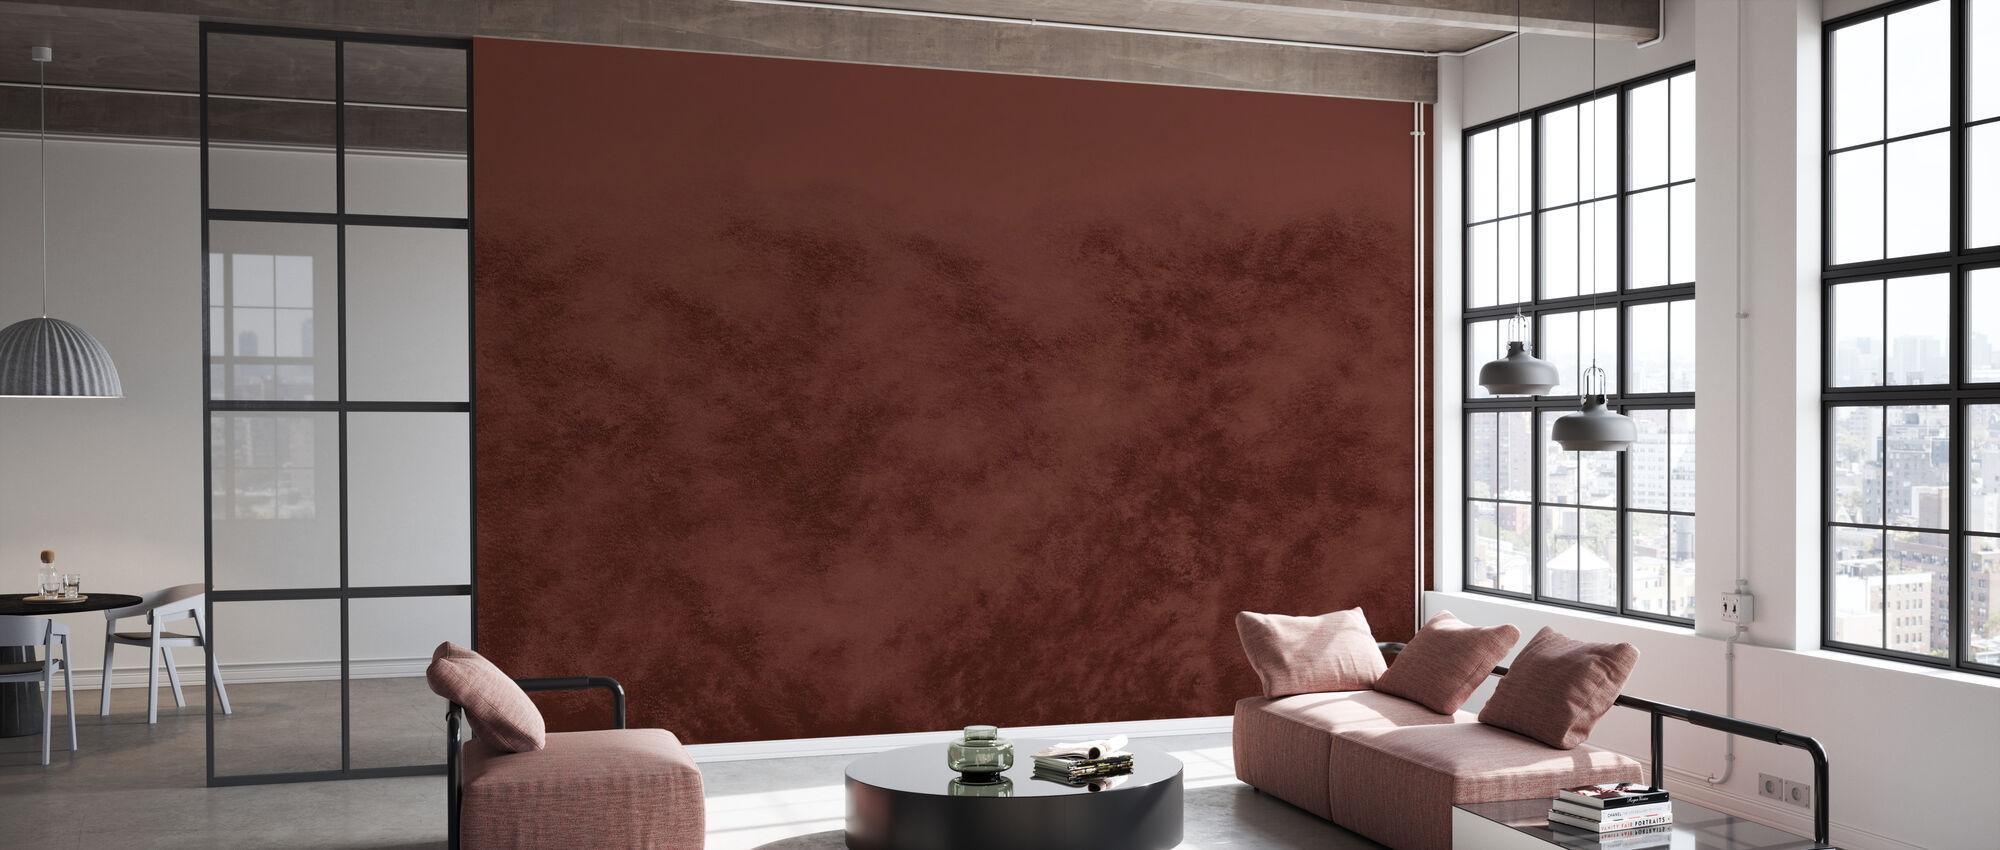 Flutter - Terracotta - Wallpaper - Office